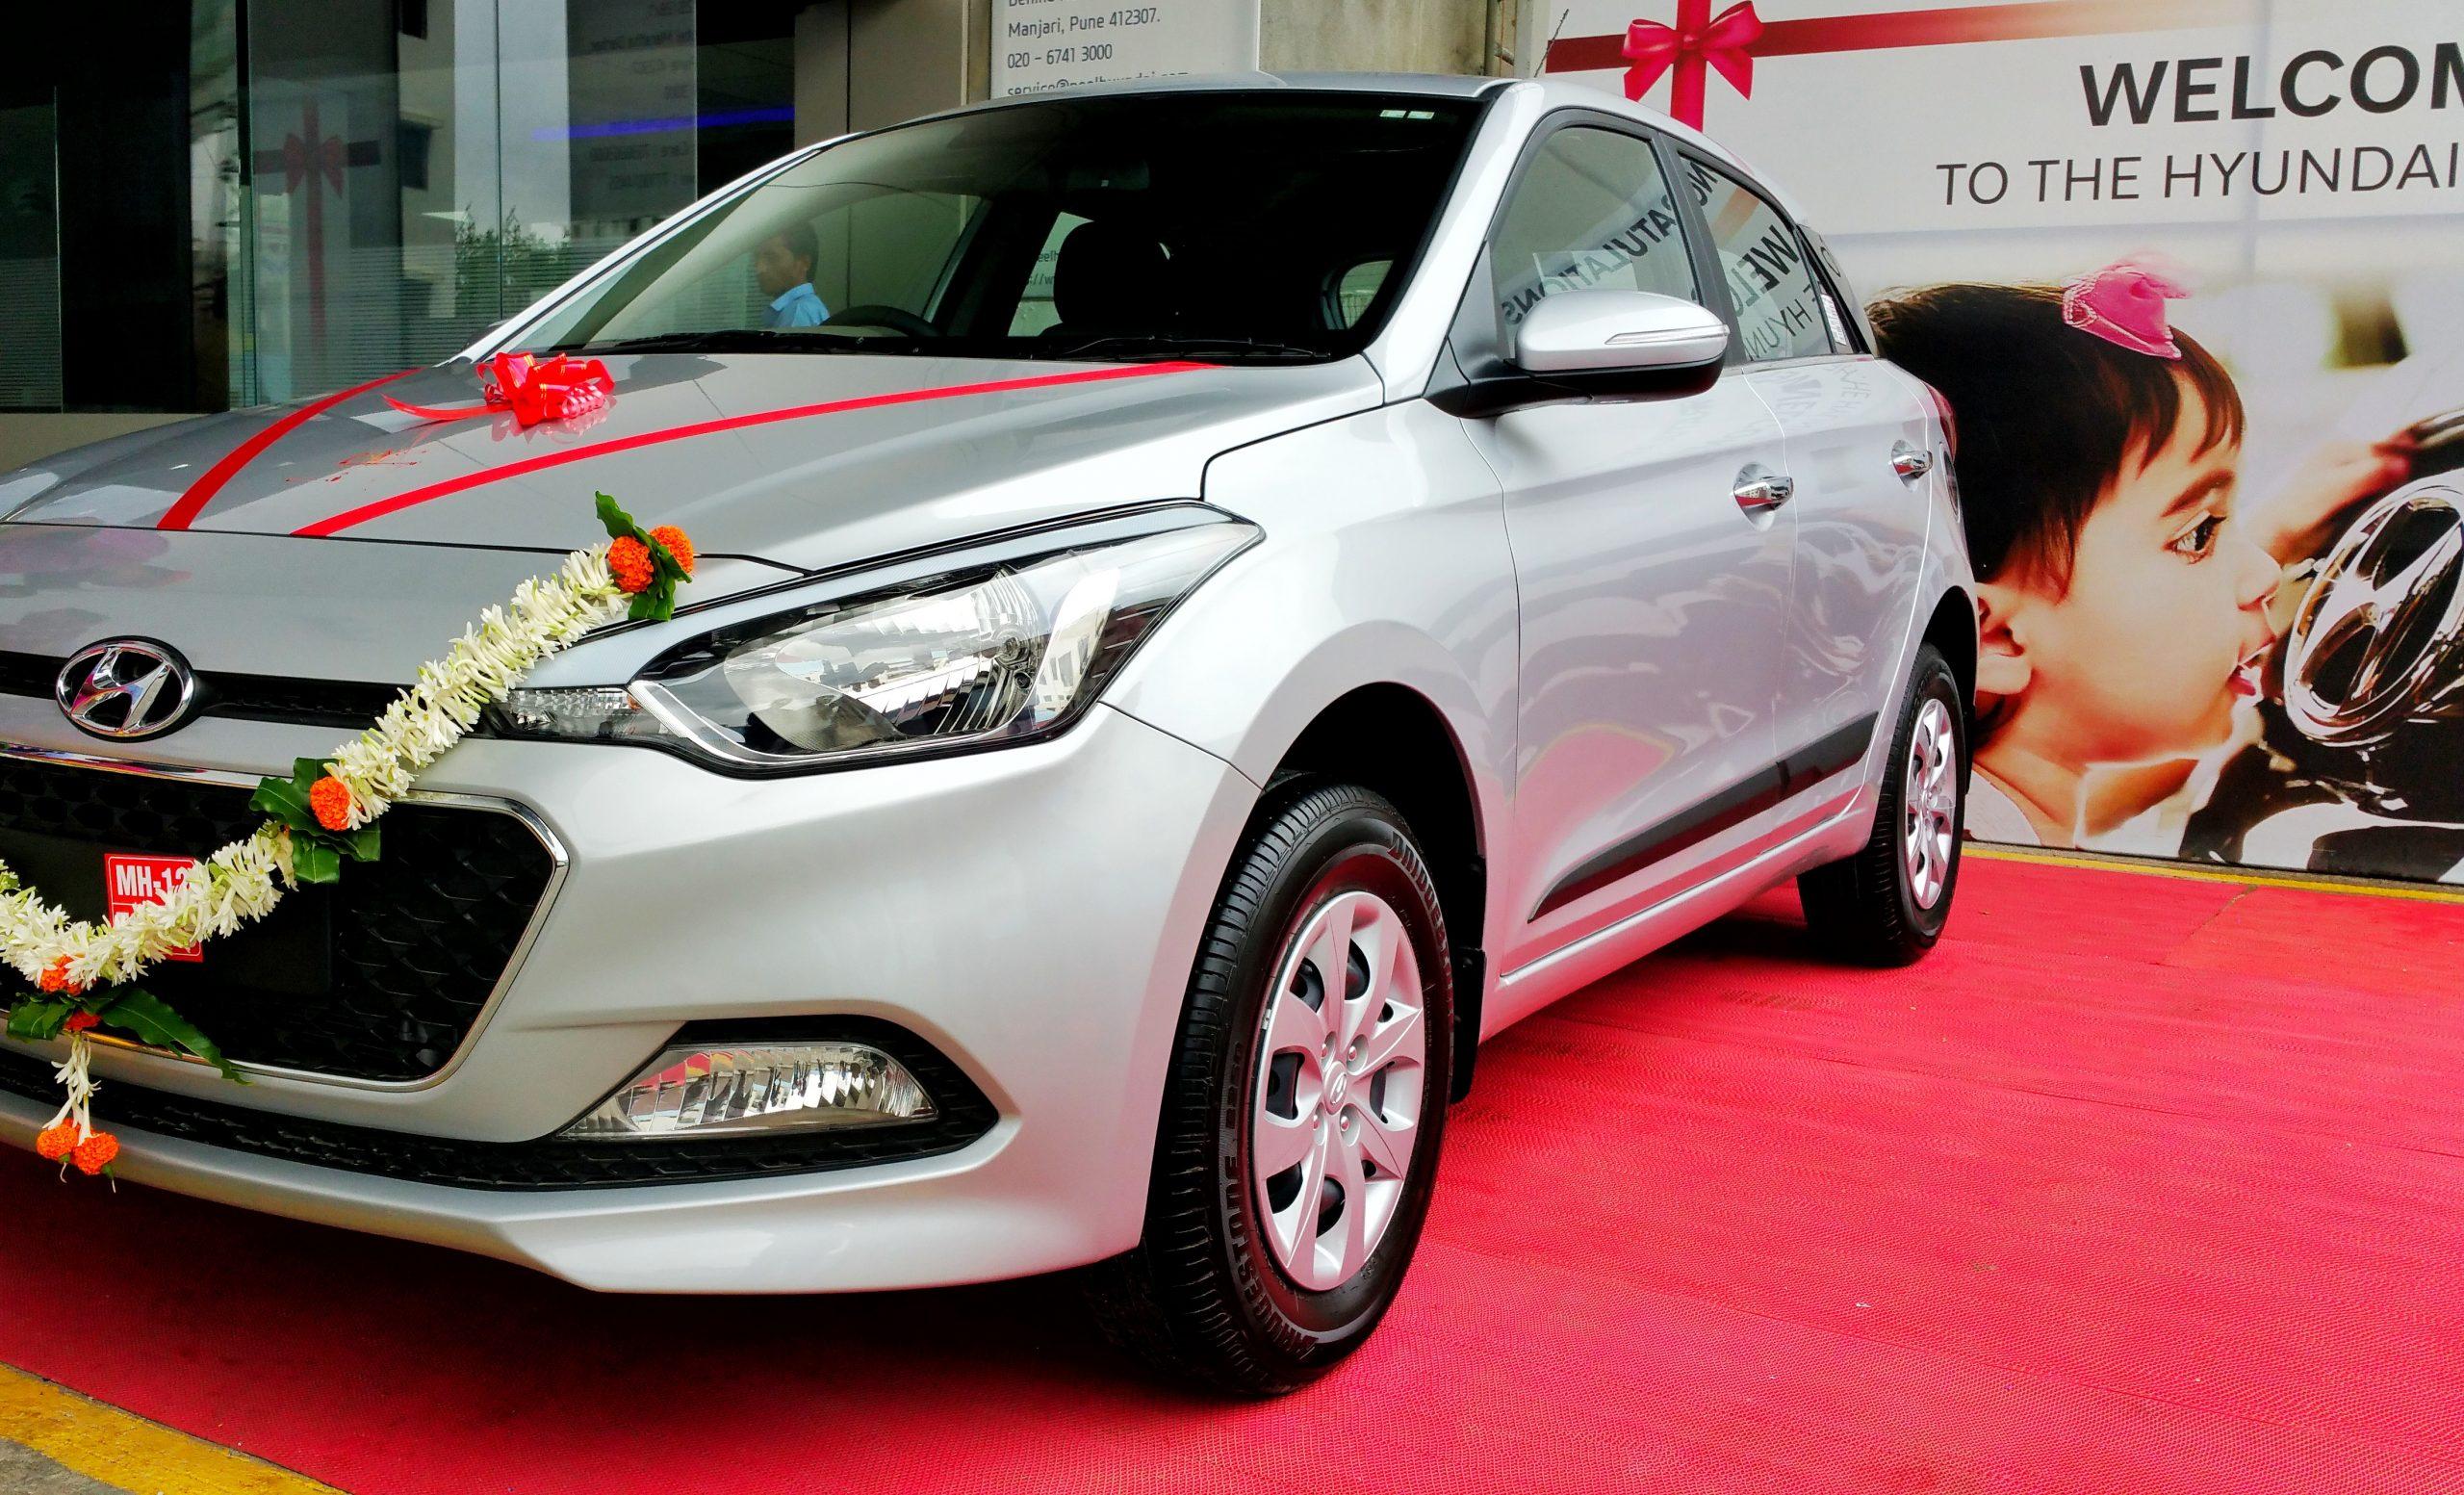 Hyundai Customer Service >> Sandeep Jadhav's Hyundai Elite i20 Sportz CRDi - AutoGenius